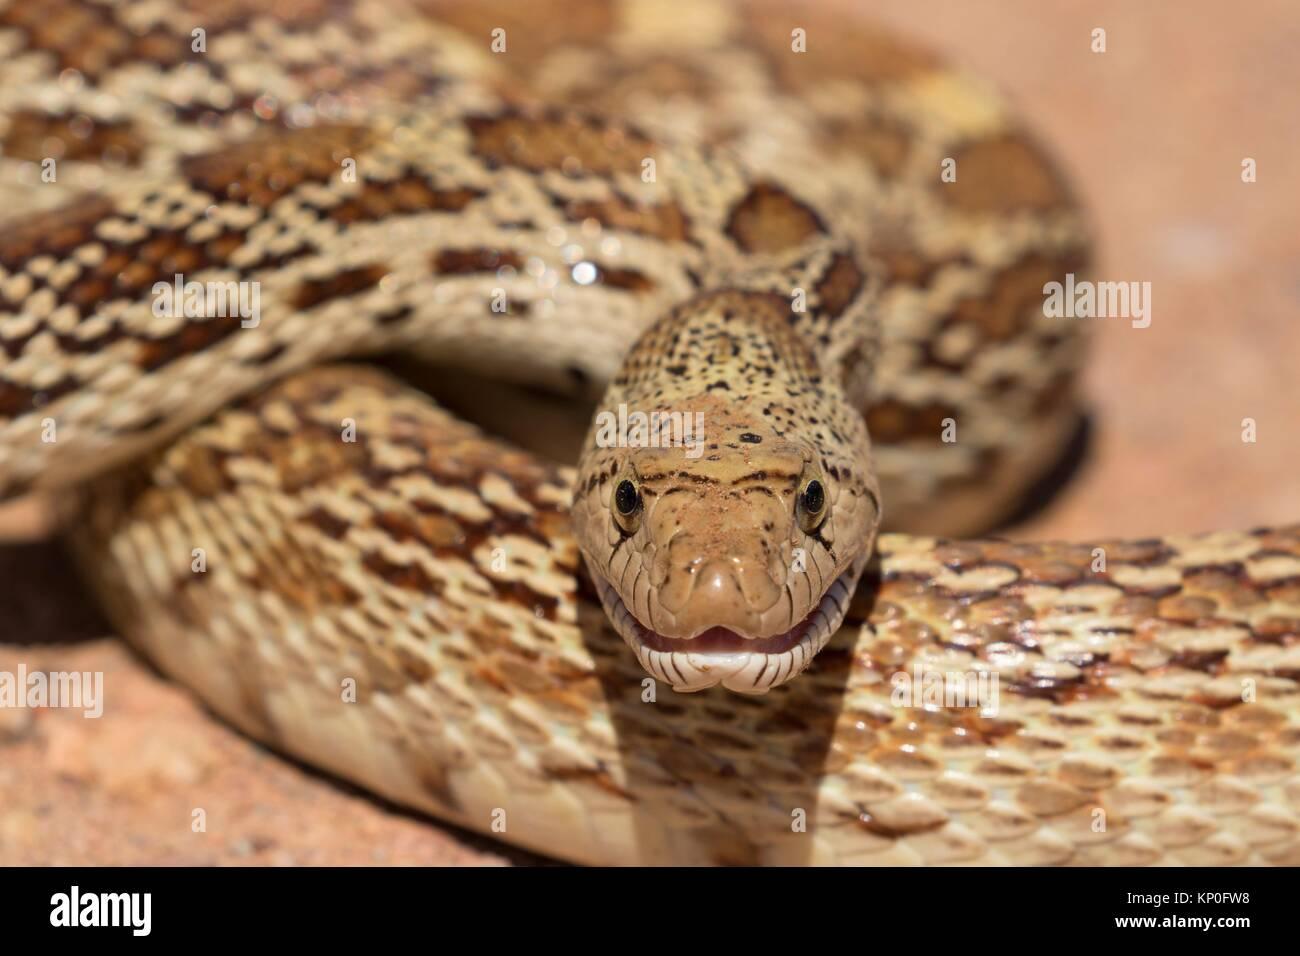 Gopher snake, organo a canne Cactus monumento nazionale, Arizona. Immagini Stock